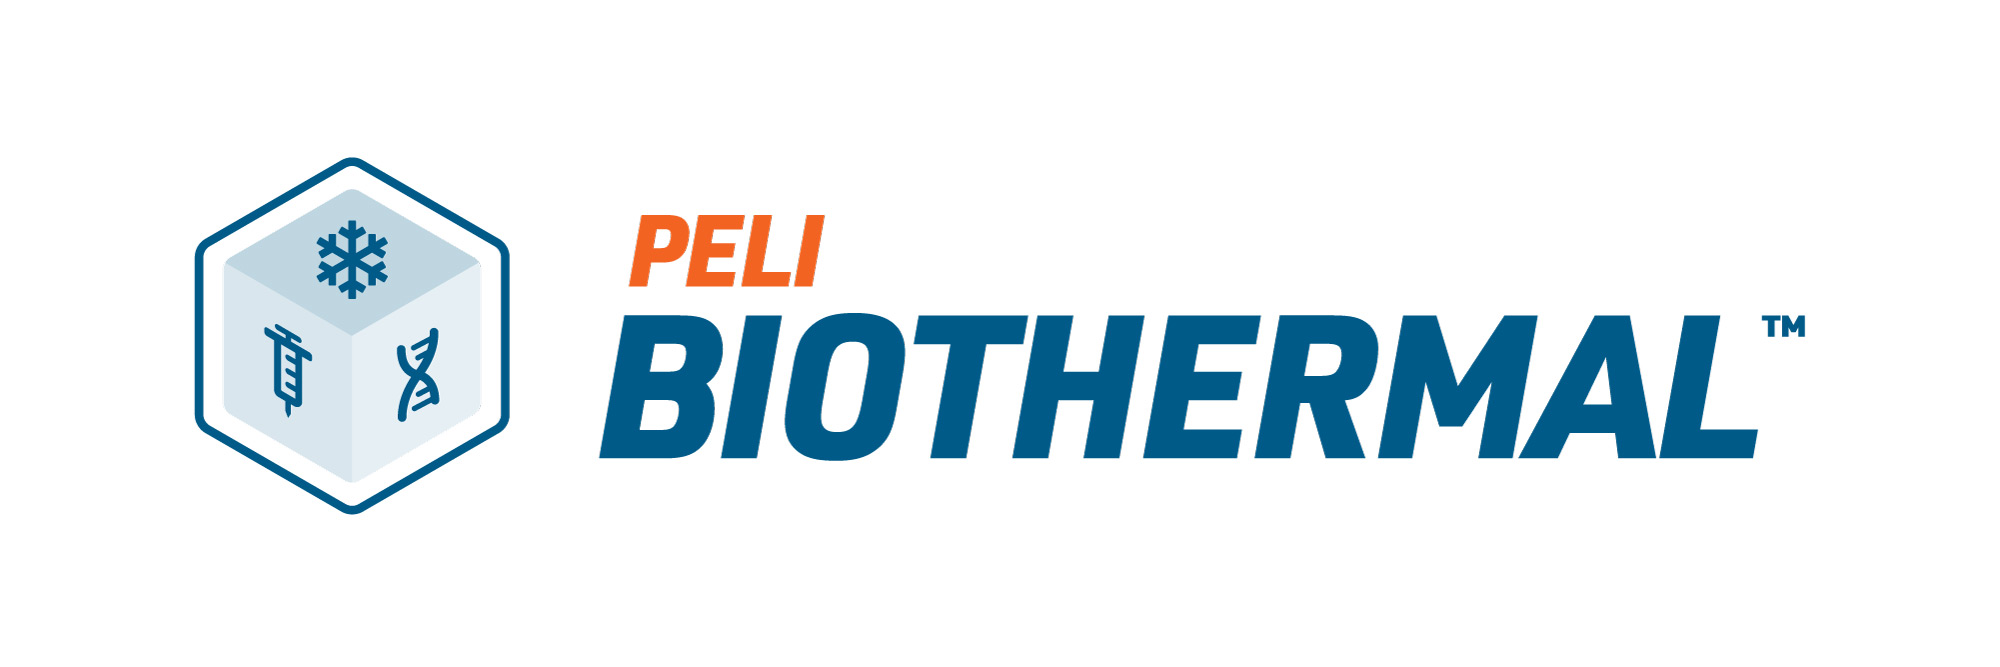 peli_logo_full_color